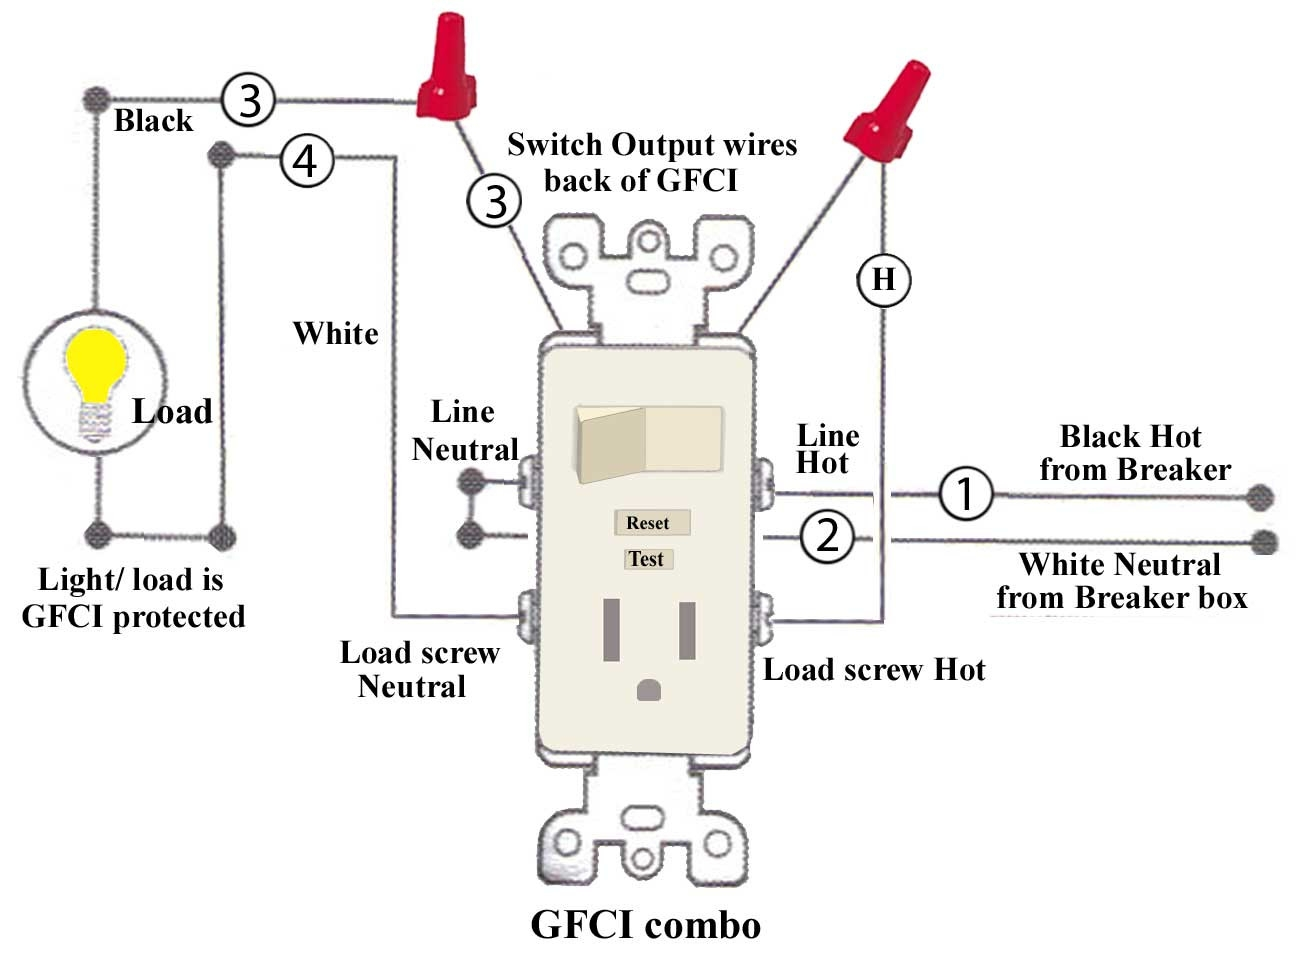 hight resolution of leviton gfci receptacle wiring diagram single gfci wiring diagram collection cooper gfci wiring diagram and